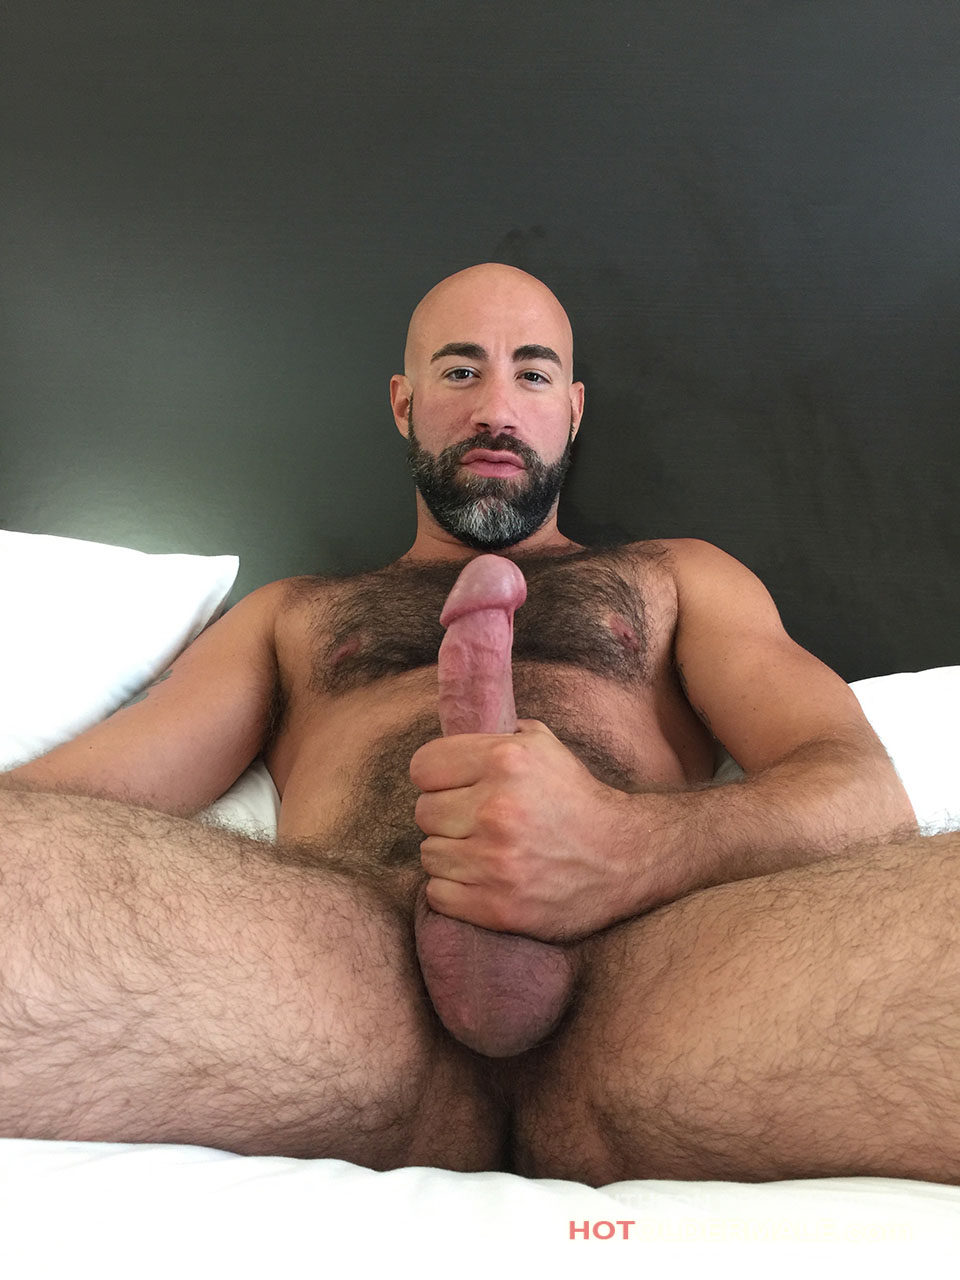 gay hardcore ass pounding porn